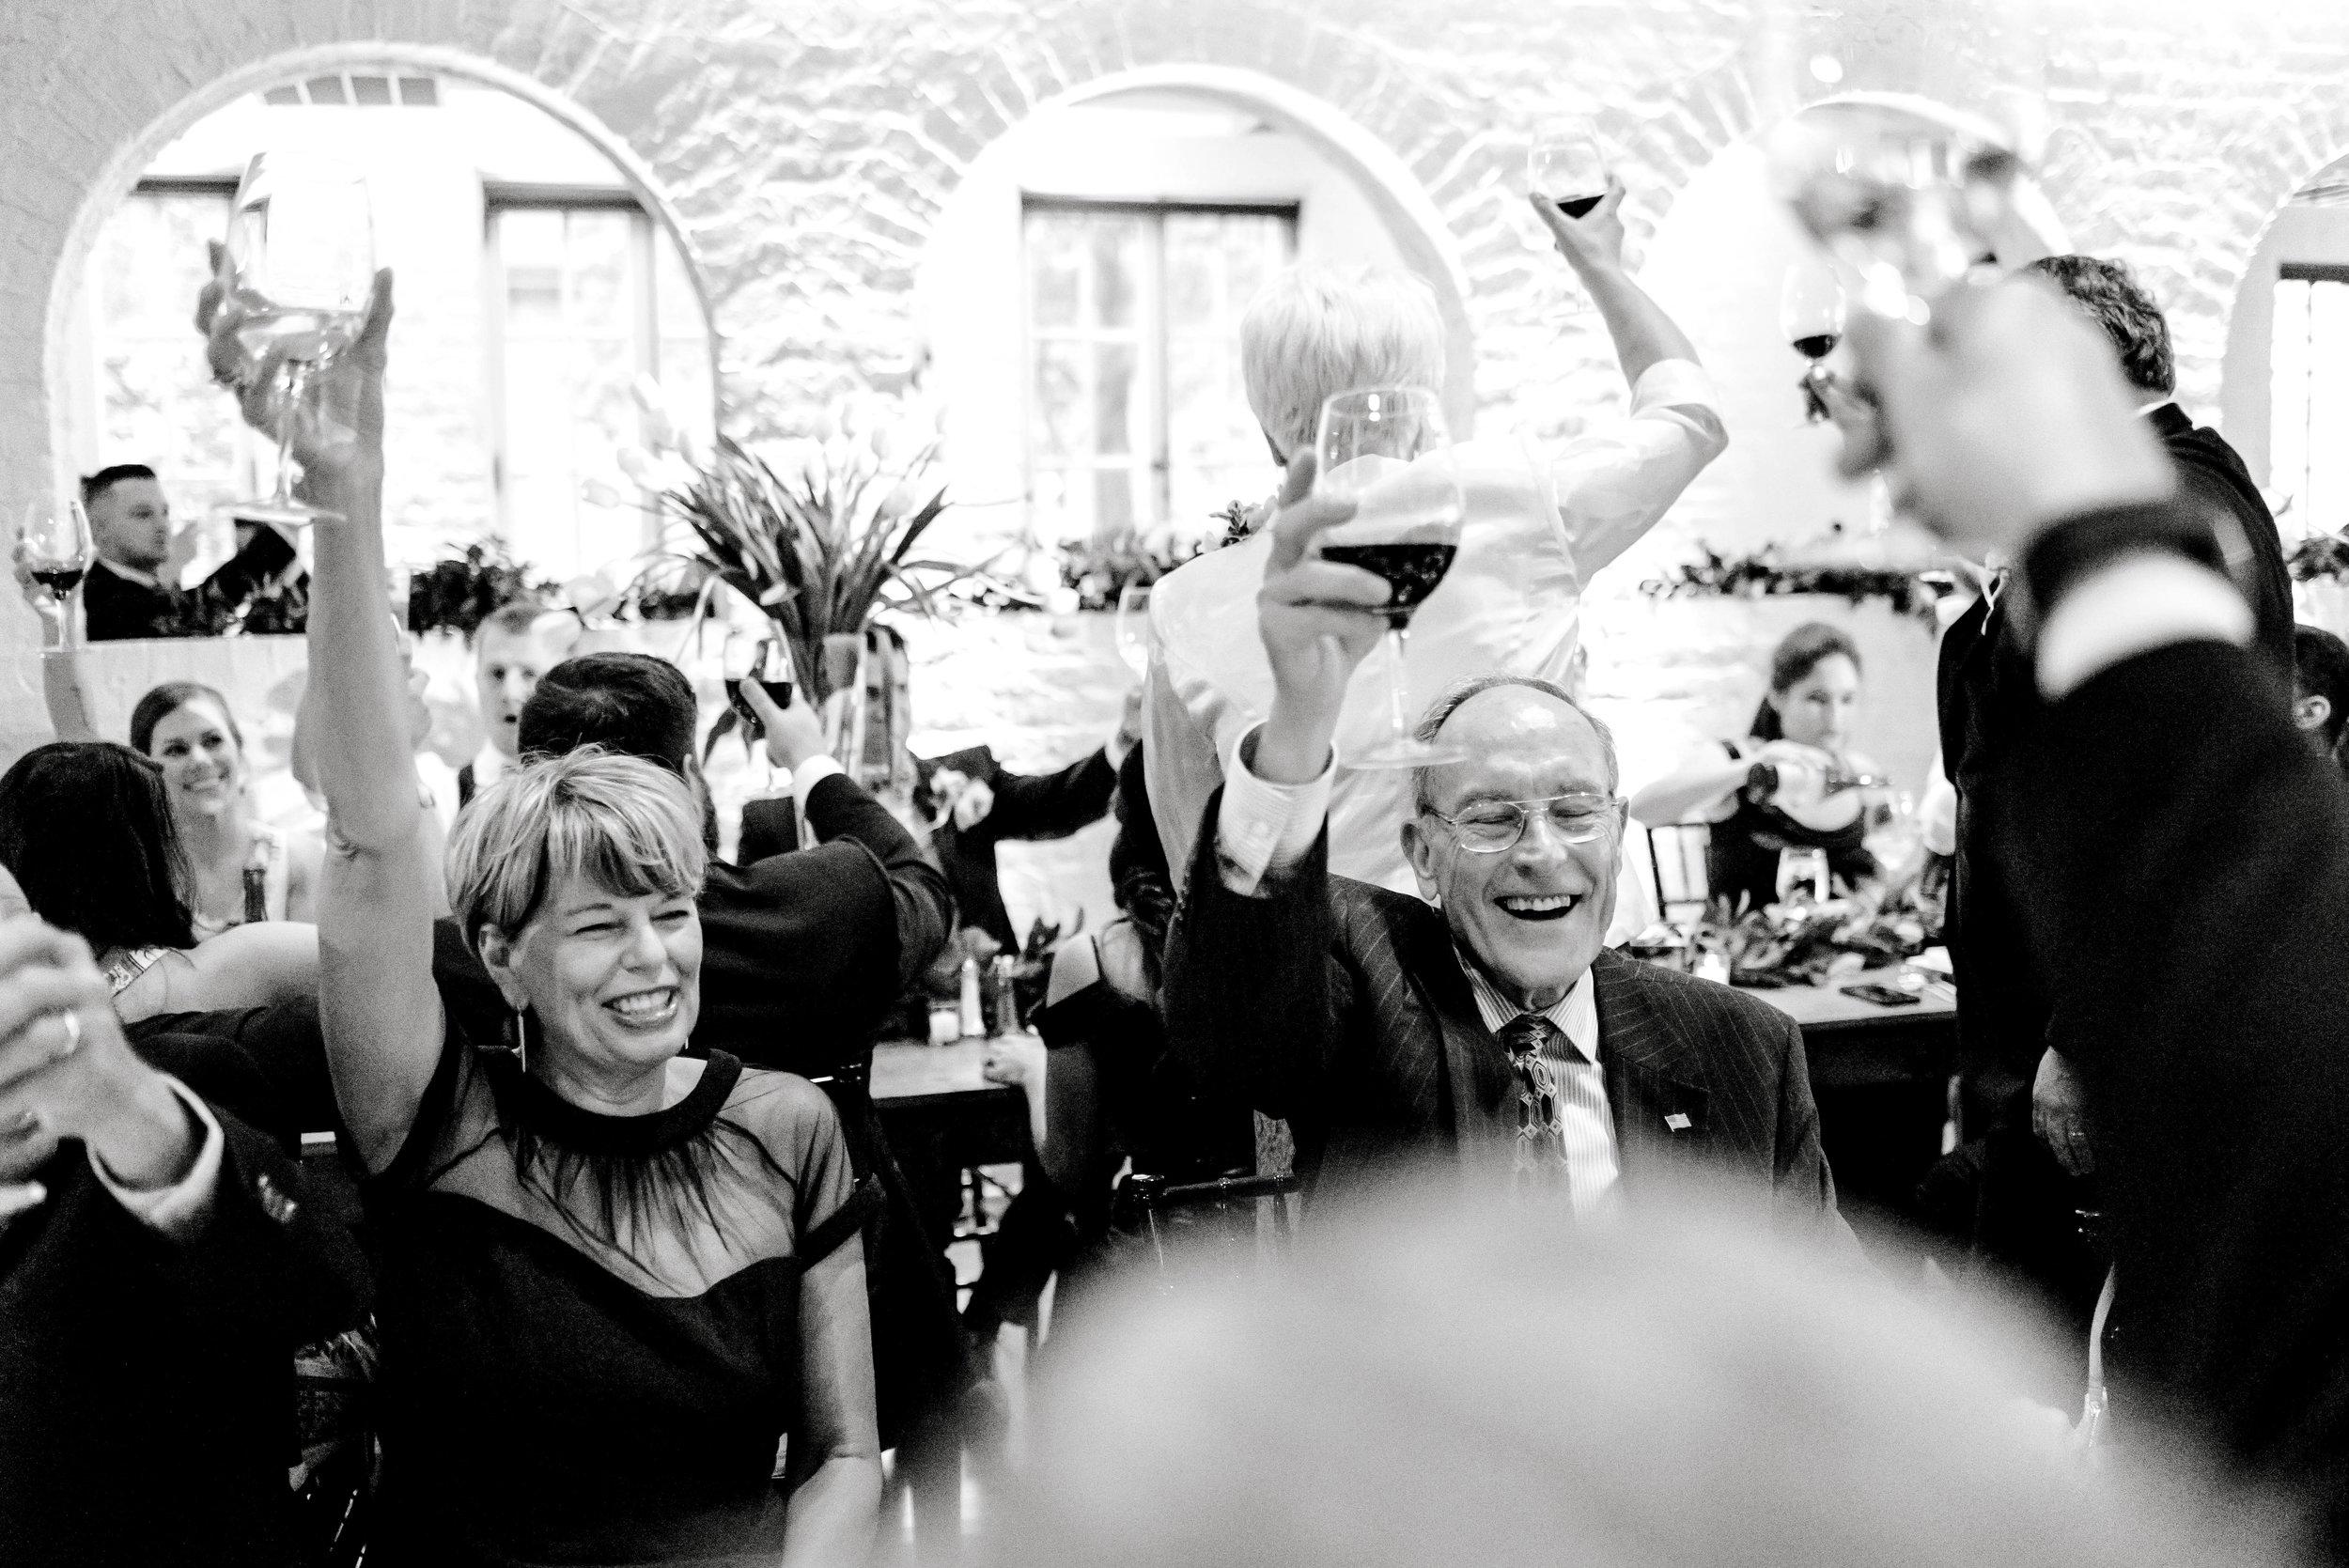 gray-door-photography-wedding-portraits-dallas-photographer-steph-erffmeyer5.jpg